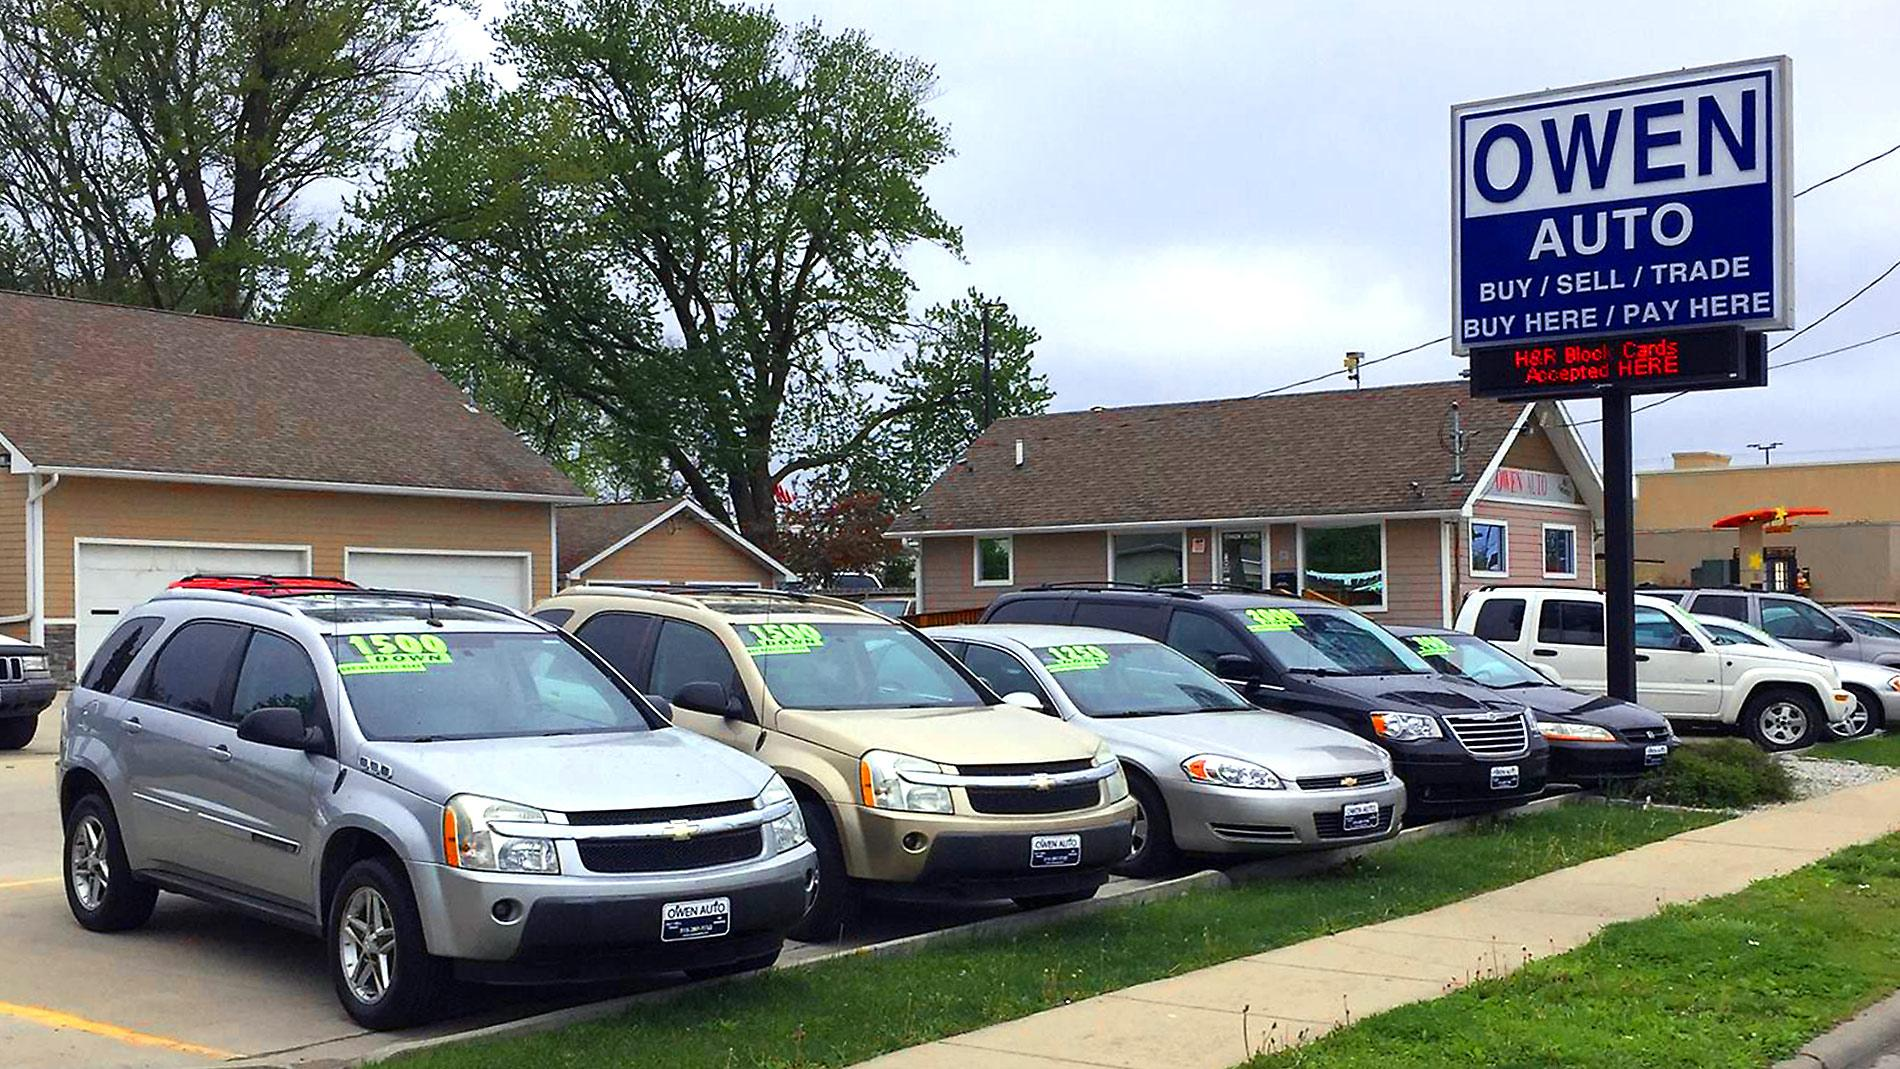 Owen Auto | Buy Here Pay Here Dealer Des Moines :: Buy Here Pay Here Dealer  Des Moines IA, Used Cars Des Moines, Bad Credit Auto Loans Des Moines IA,  ...